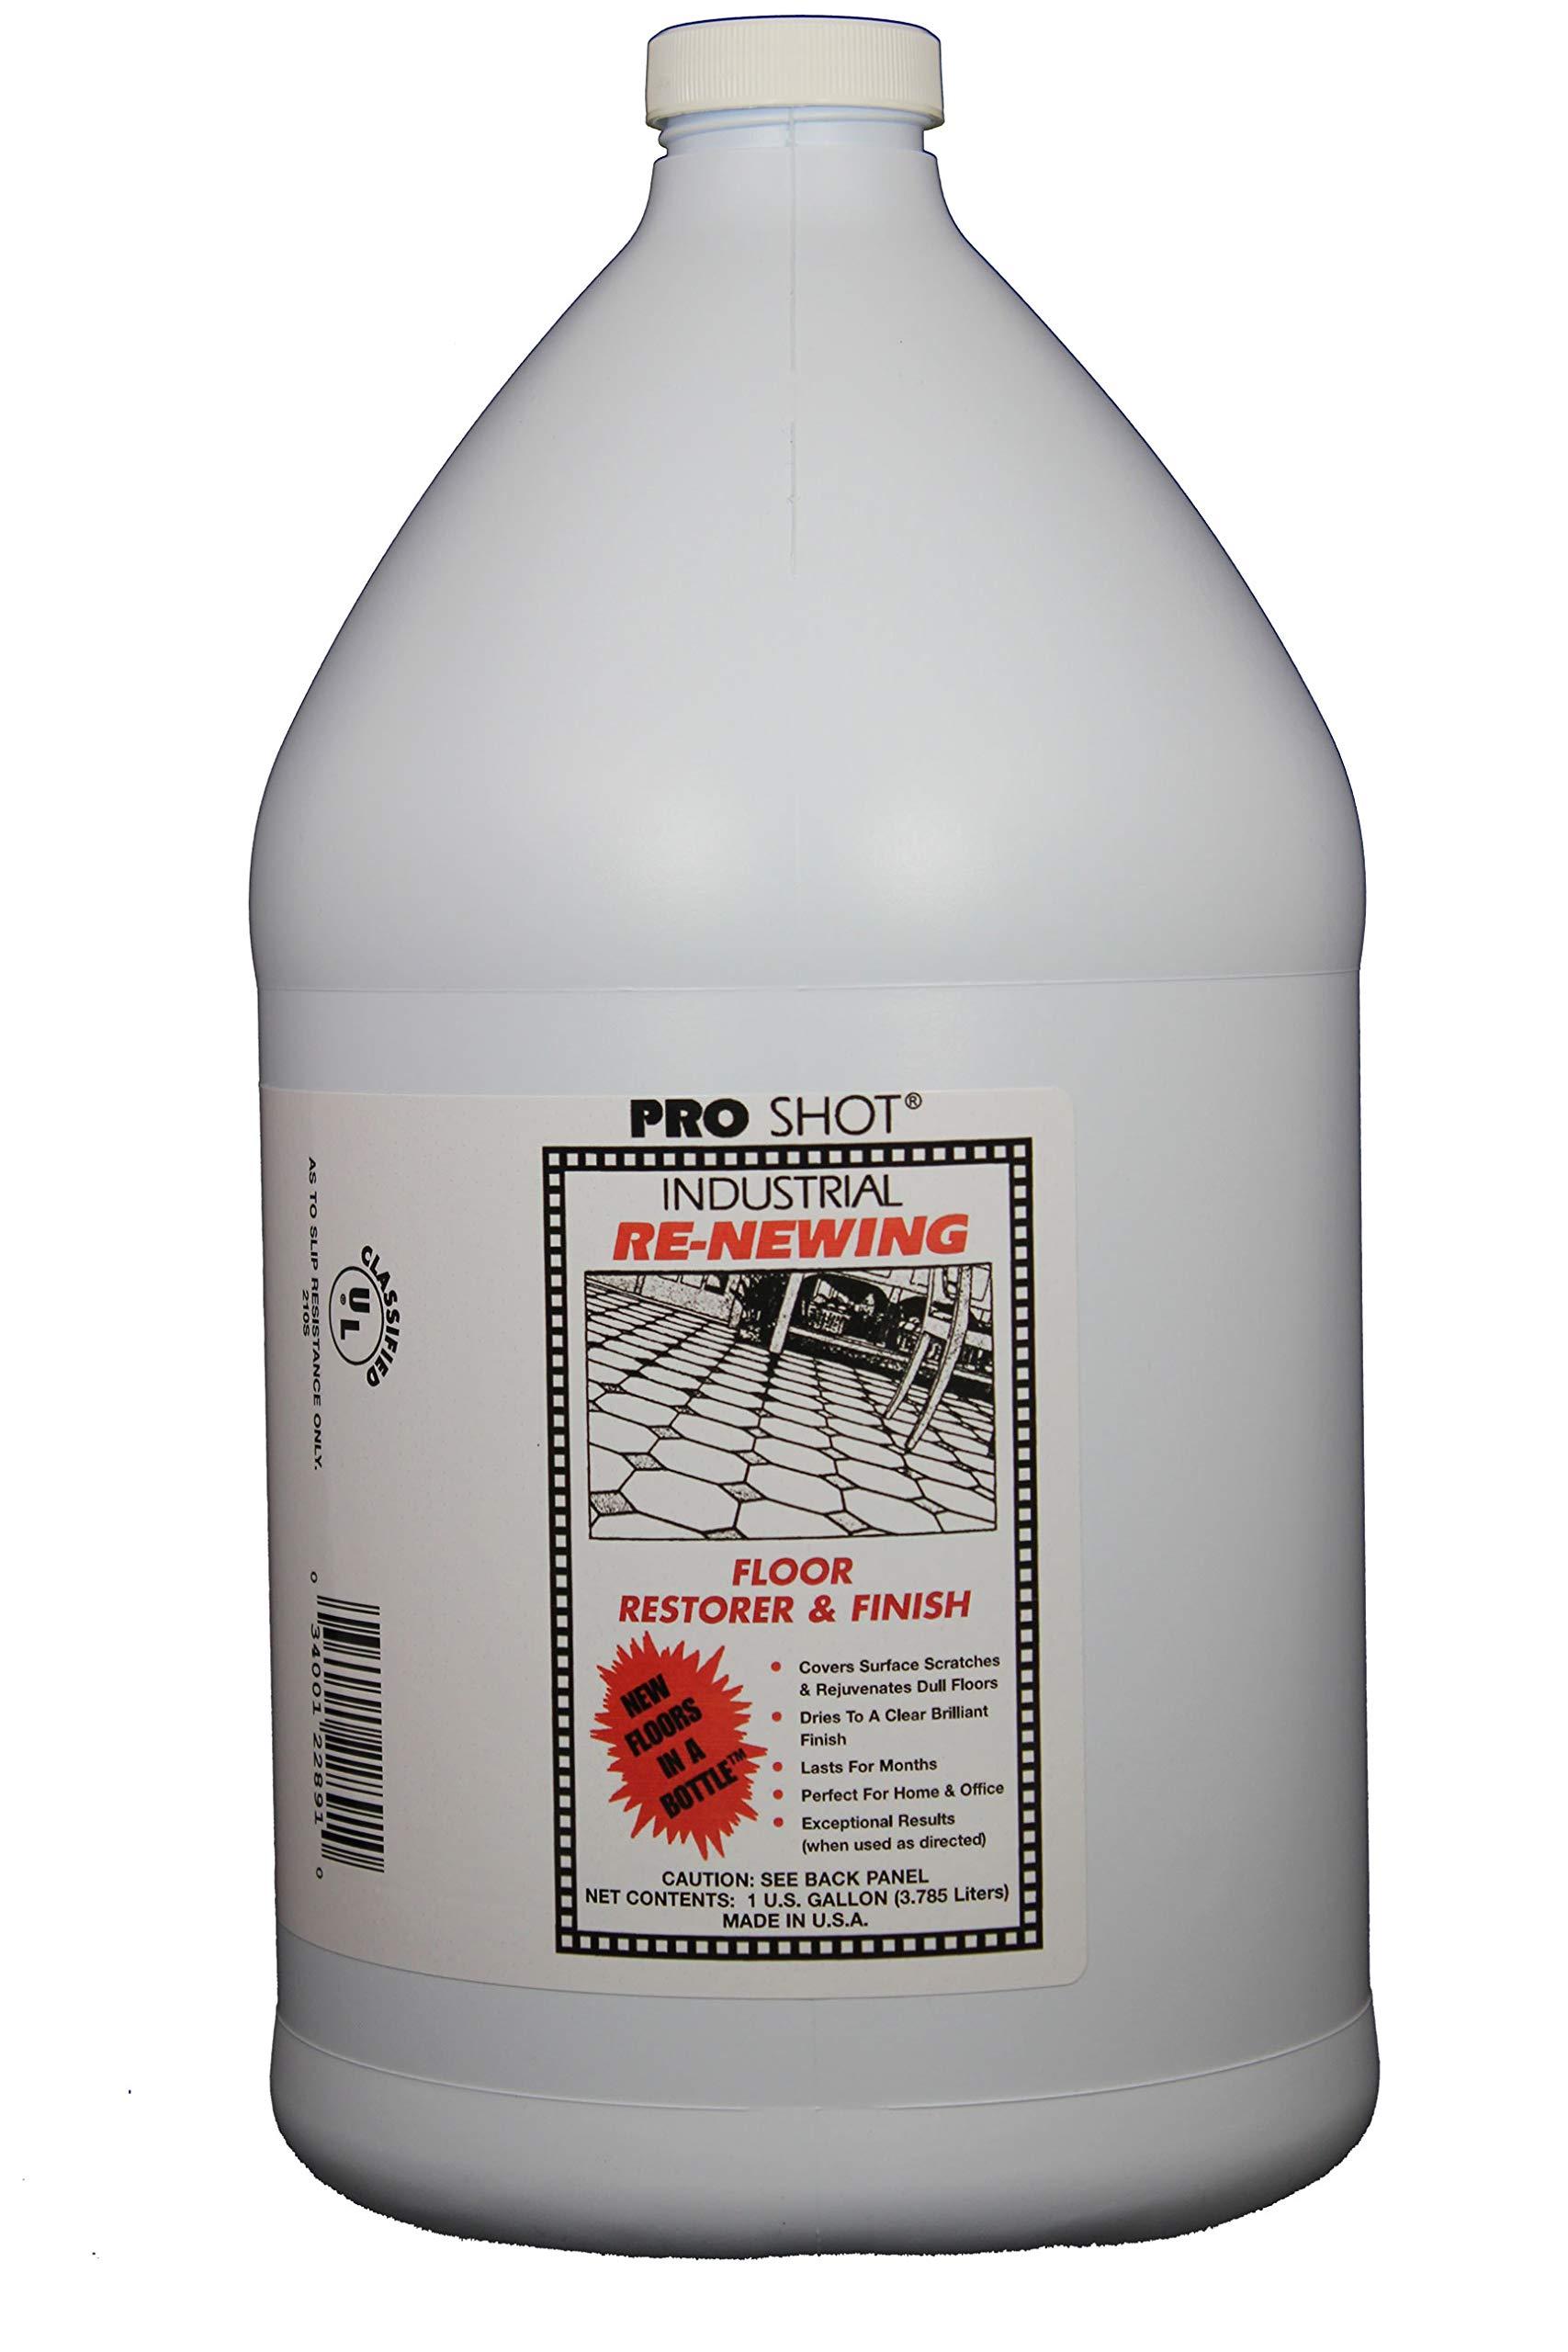 PRO SHOT Industrial Re-Newing Floor Restorer & Finish - 1 Gallon by PRO SHOT